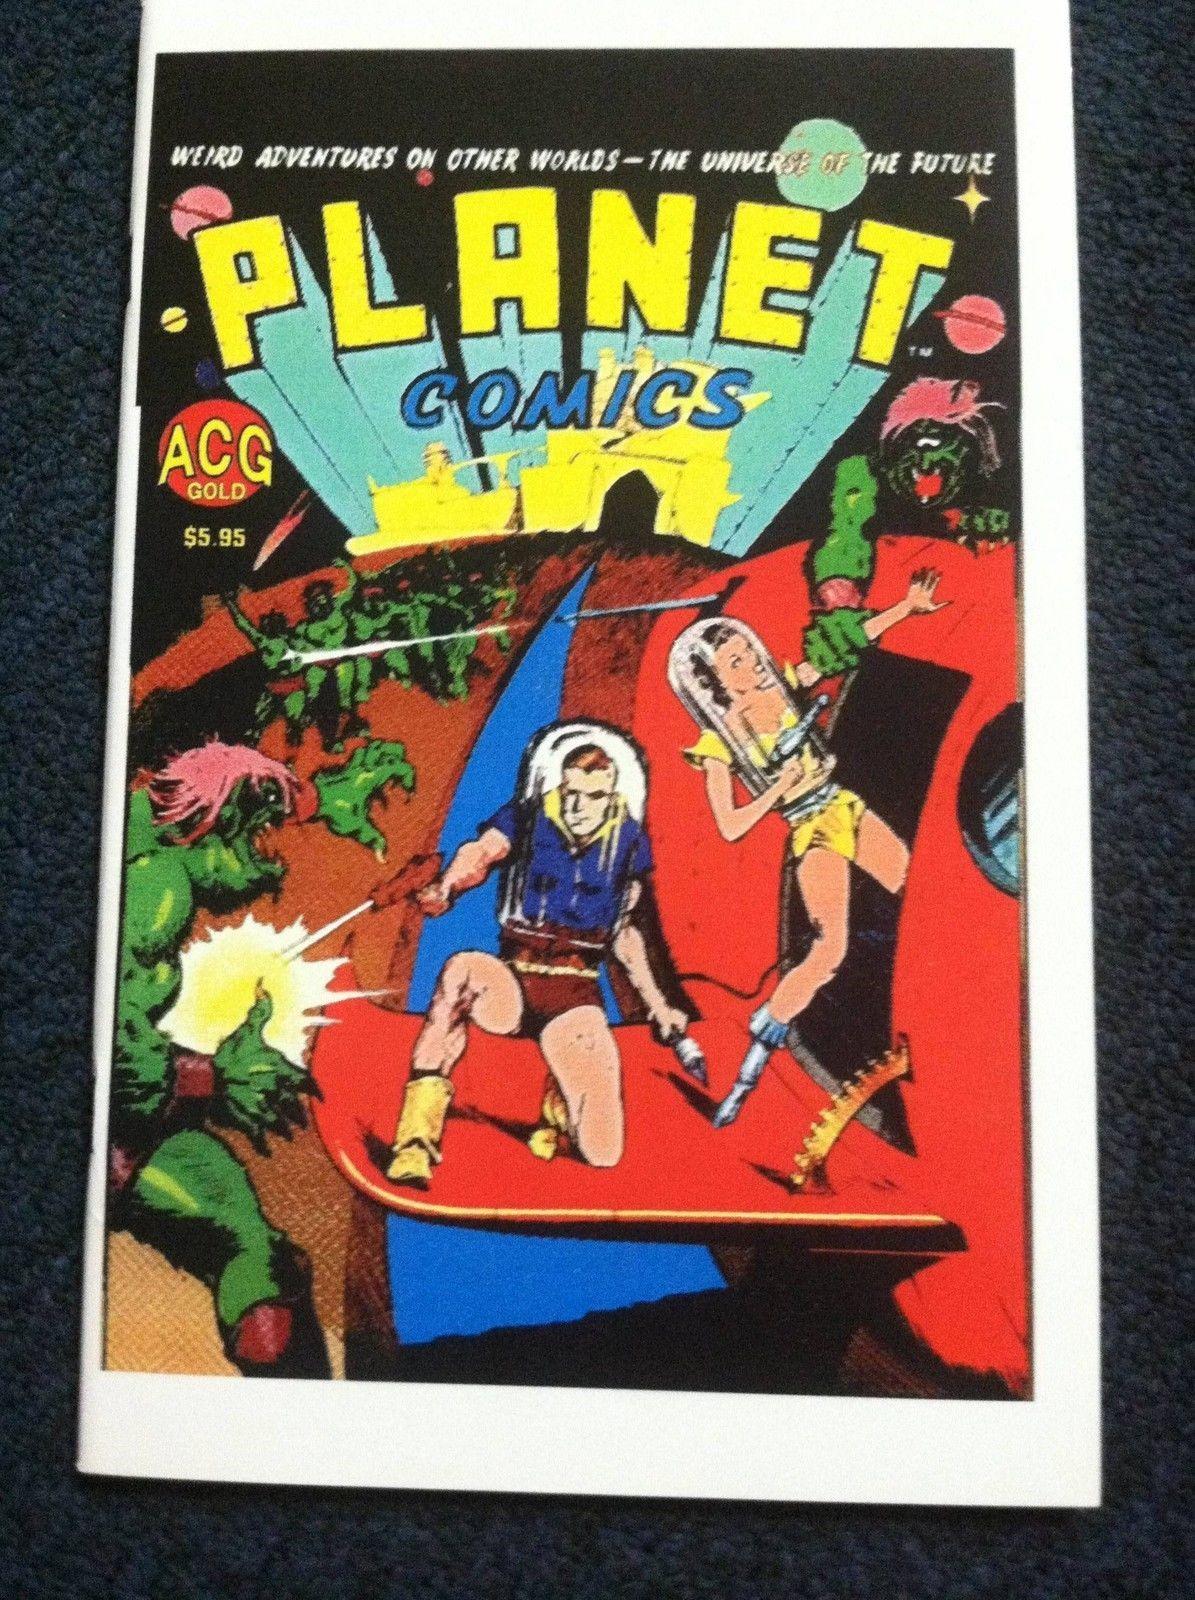 PLANET COMICS #1 (ACG) NM!